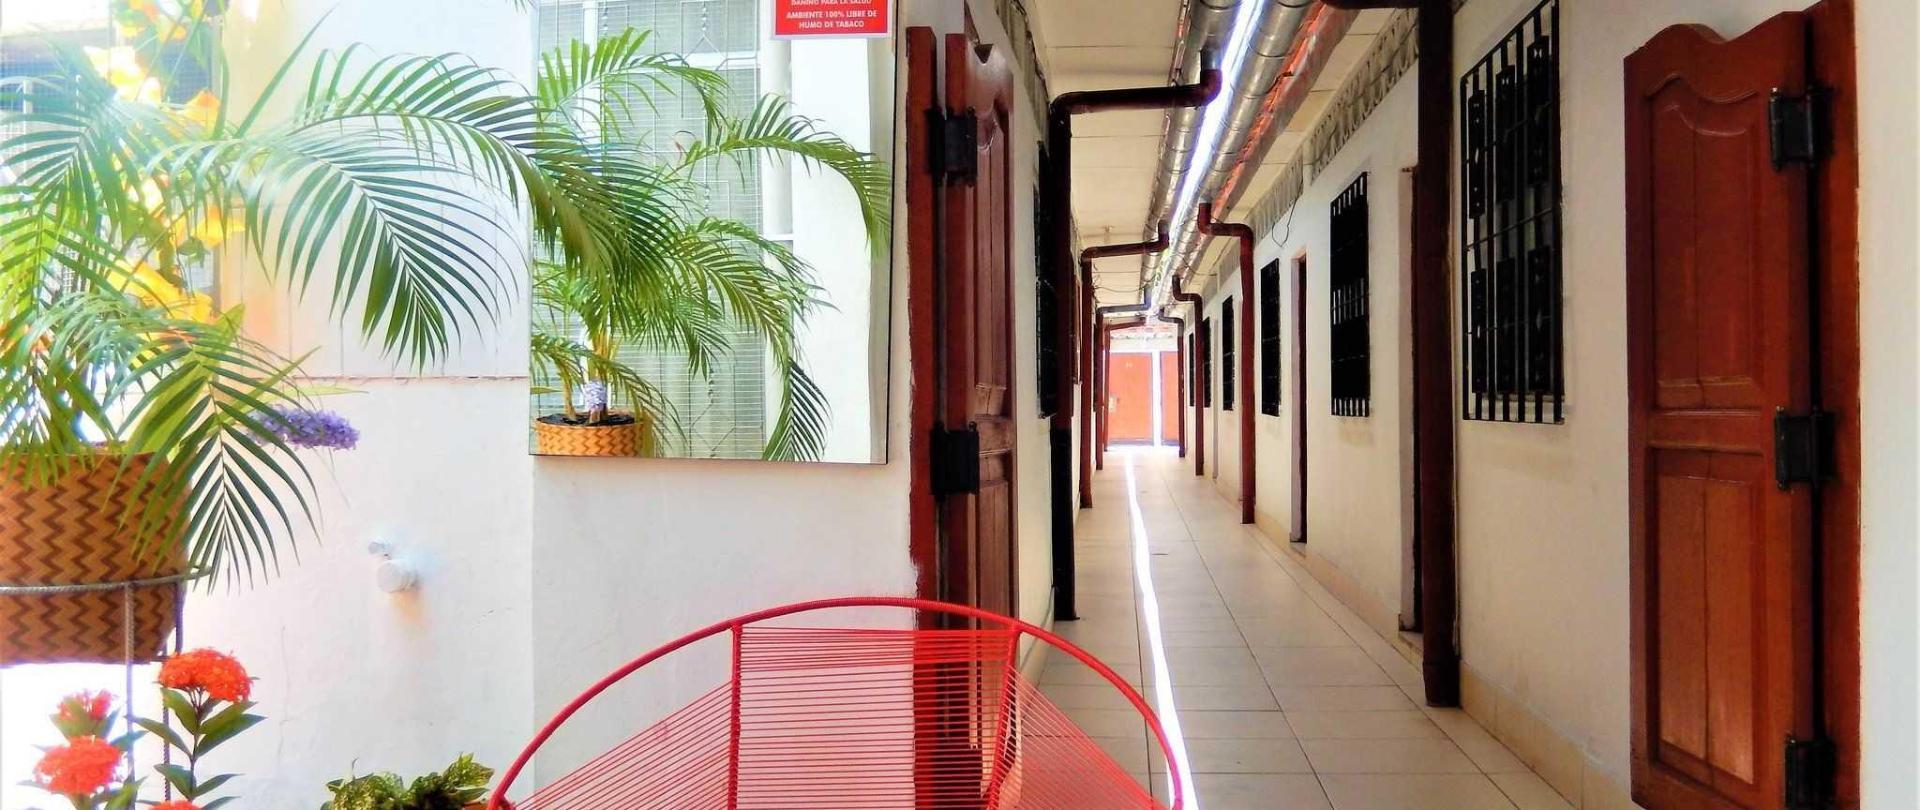 hallway-1.JPG